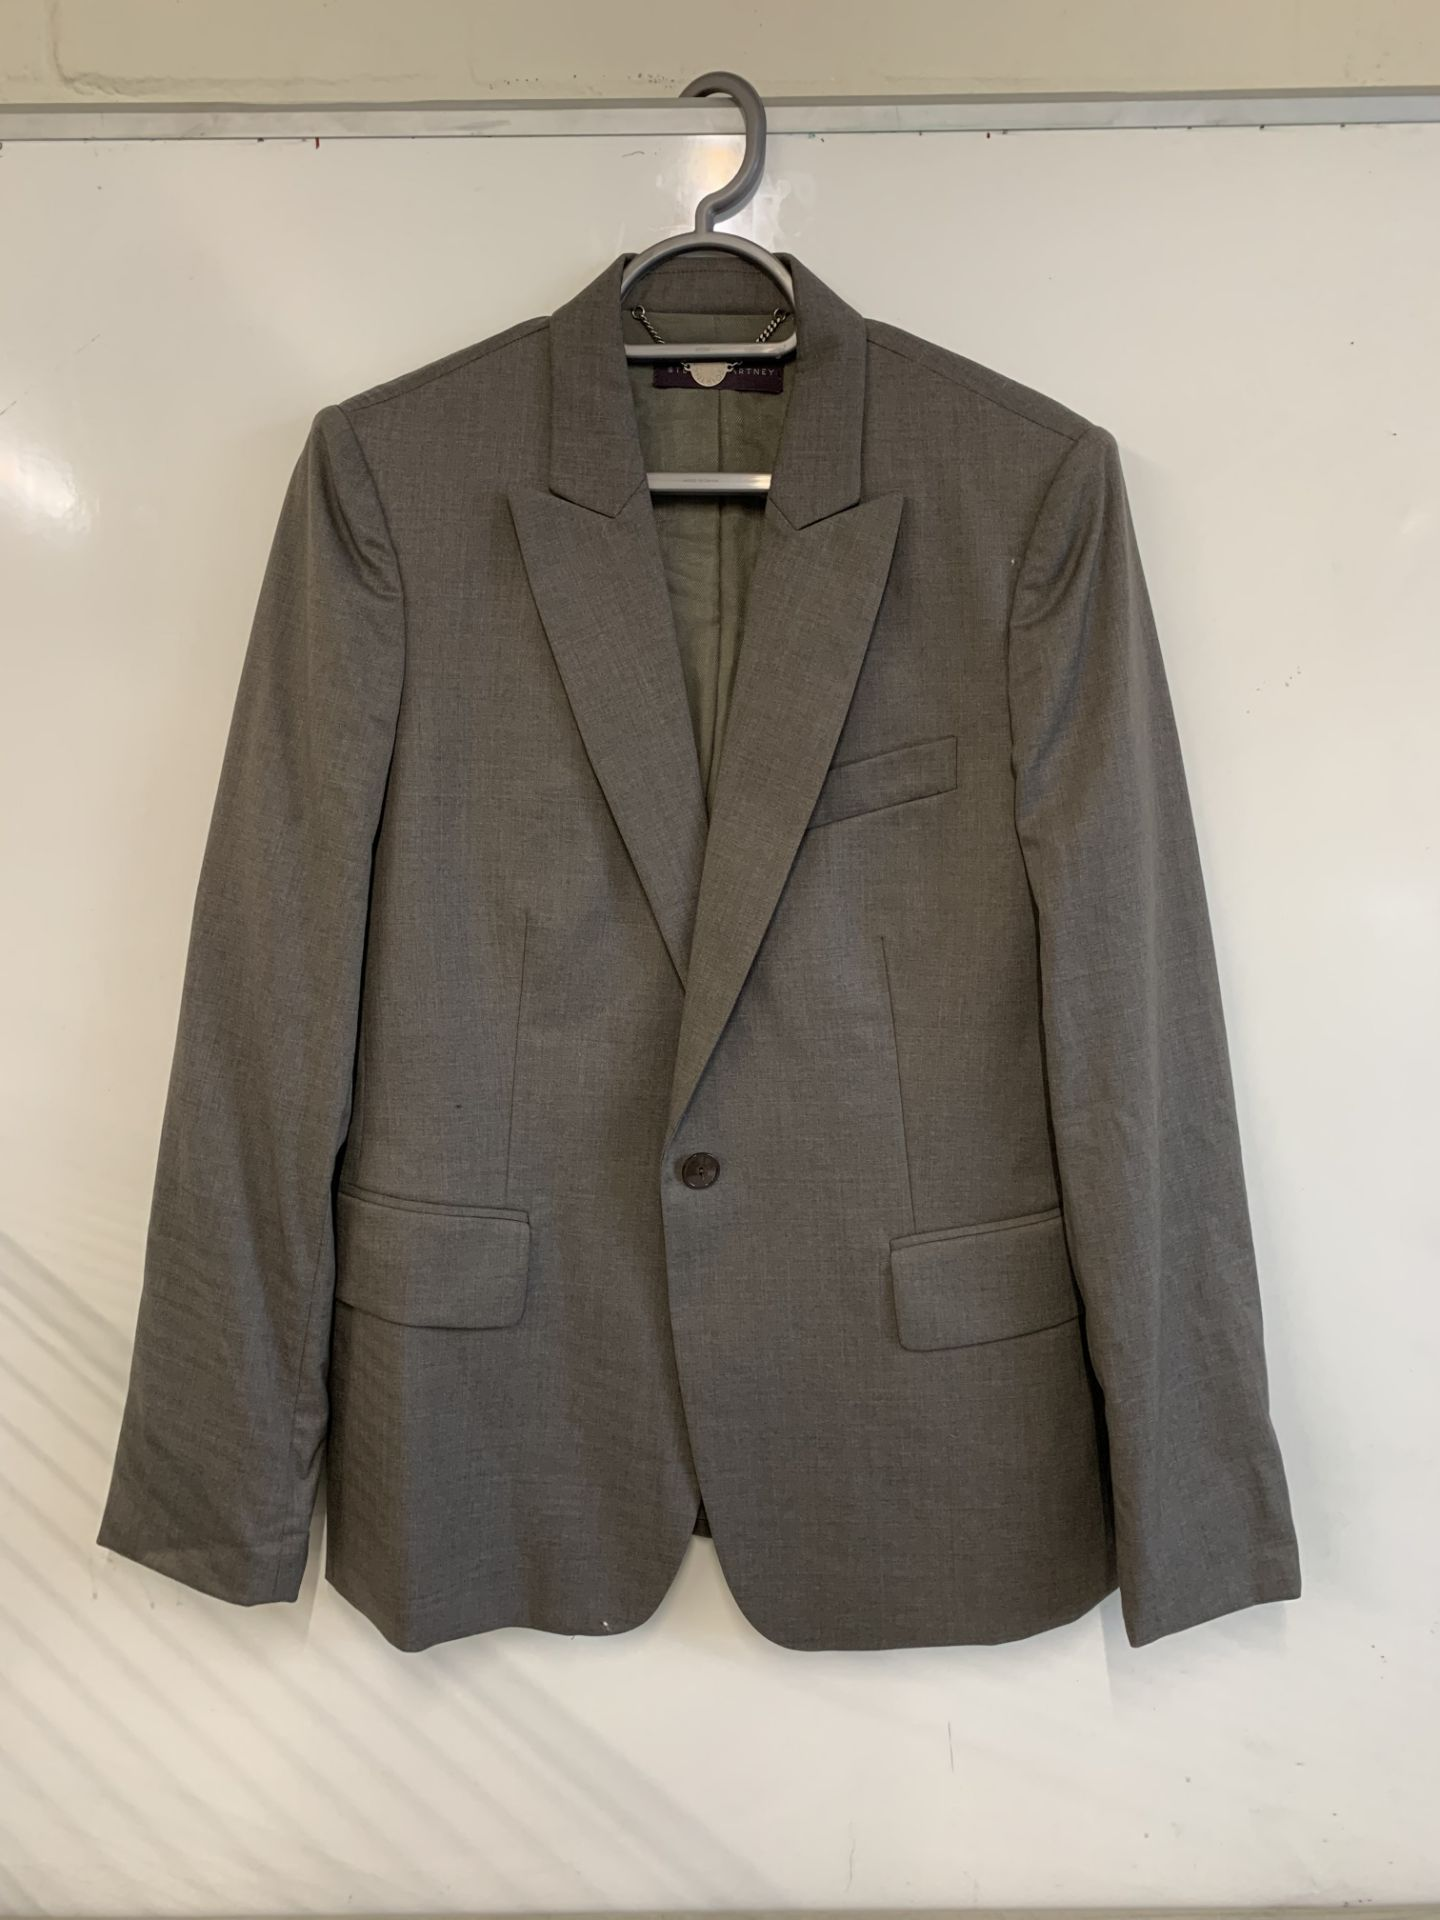 Lot 12 - Stella McCartney Grey Wool Blazer RRP £998.00